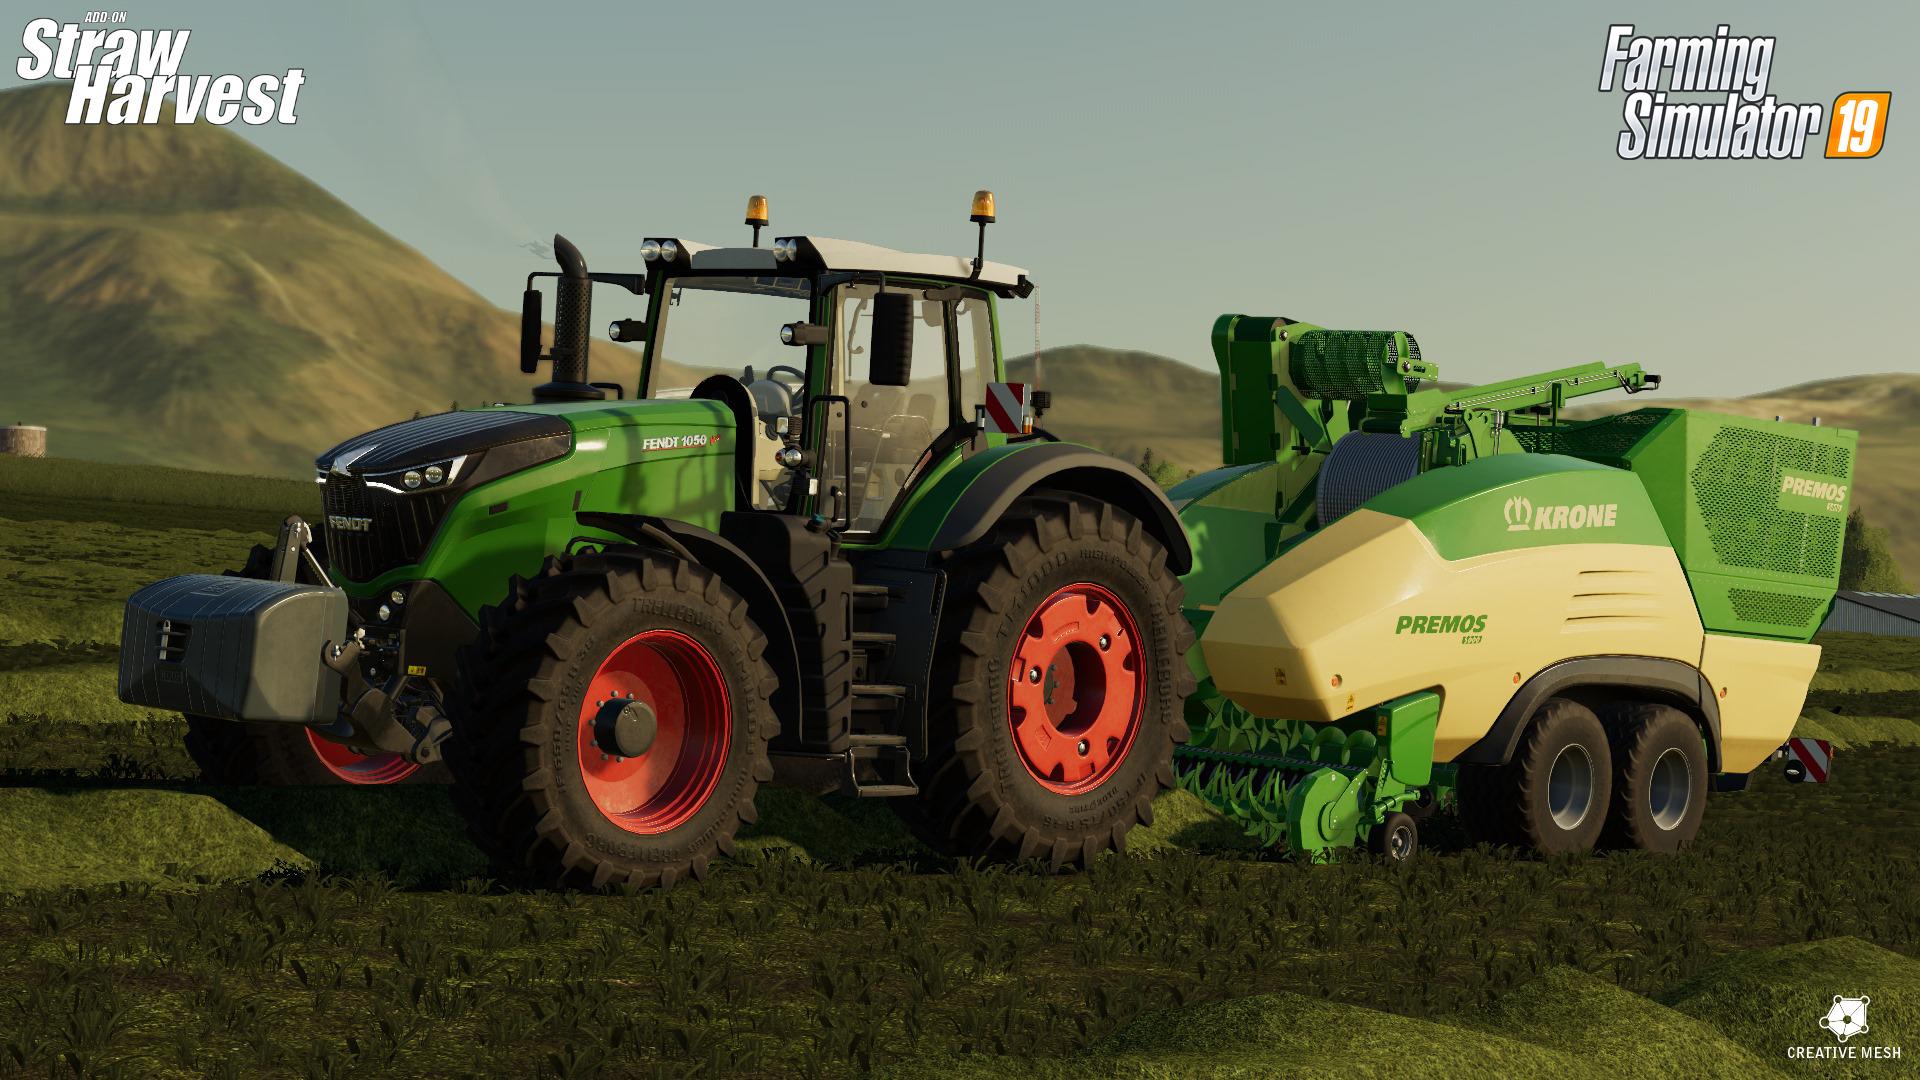 Farming Simulator 19 si espande ancora con Straw Harvest thumbnail